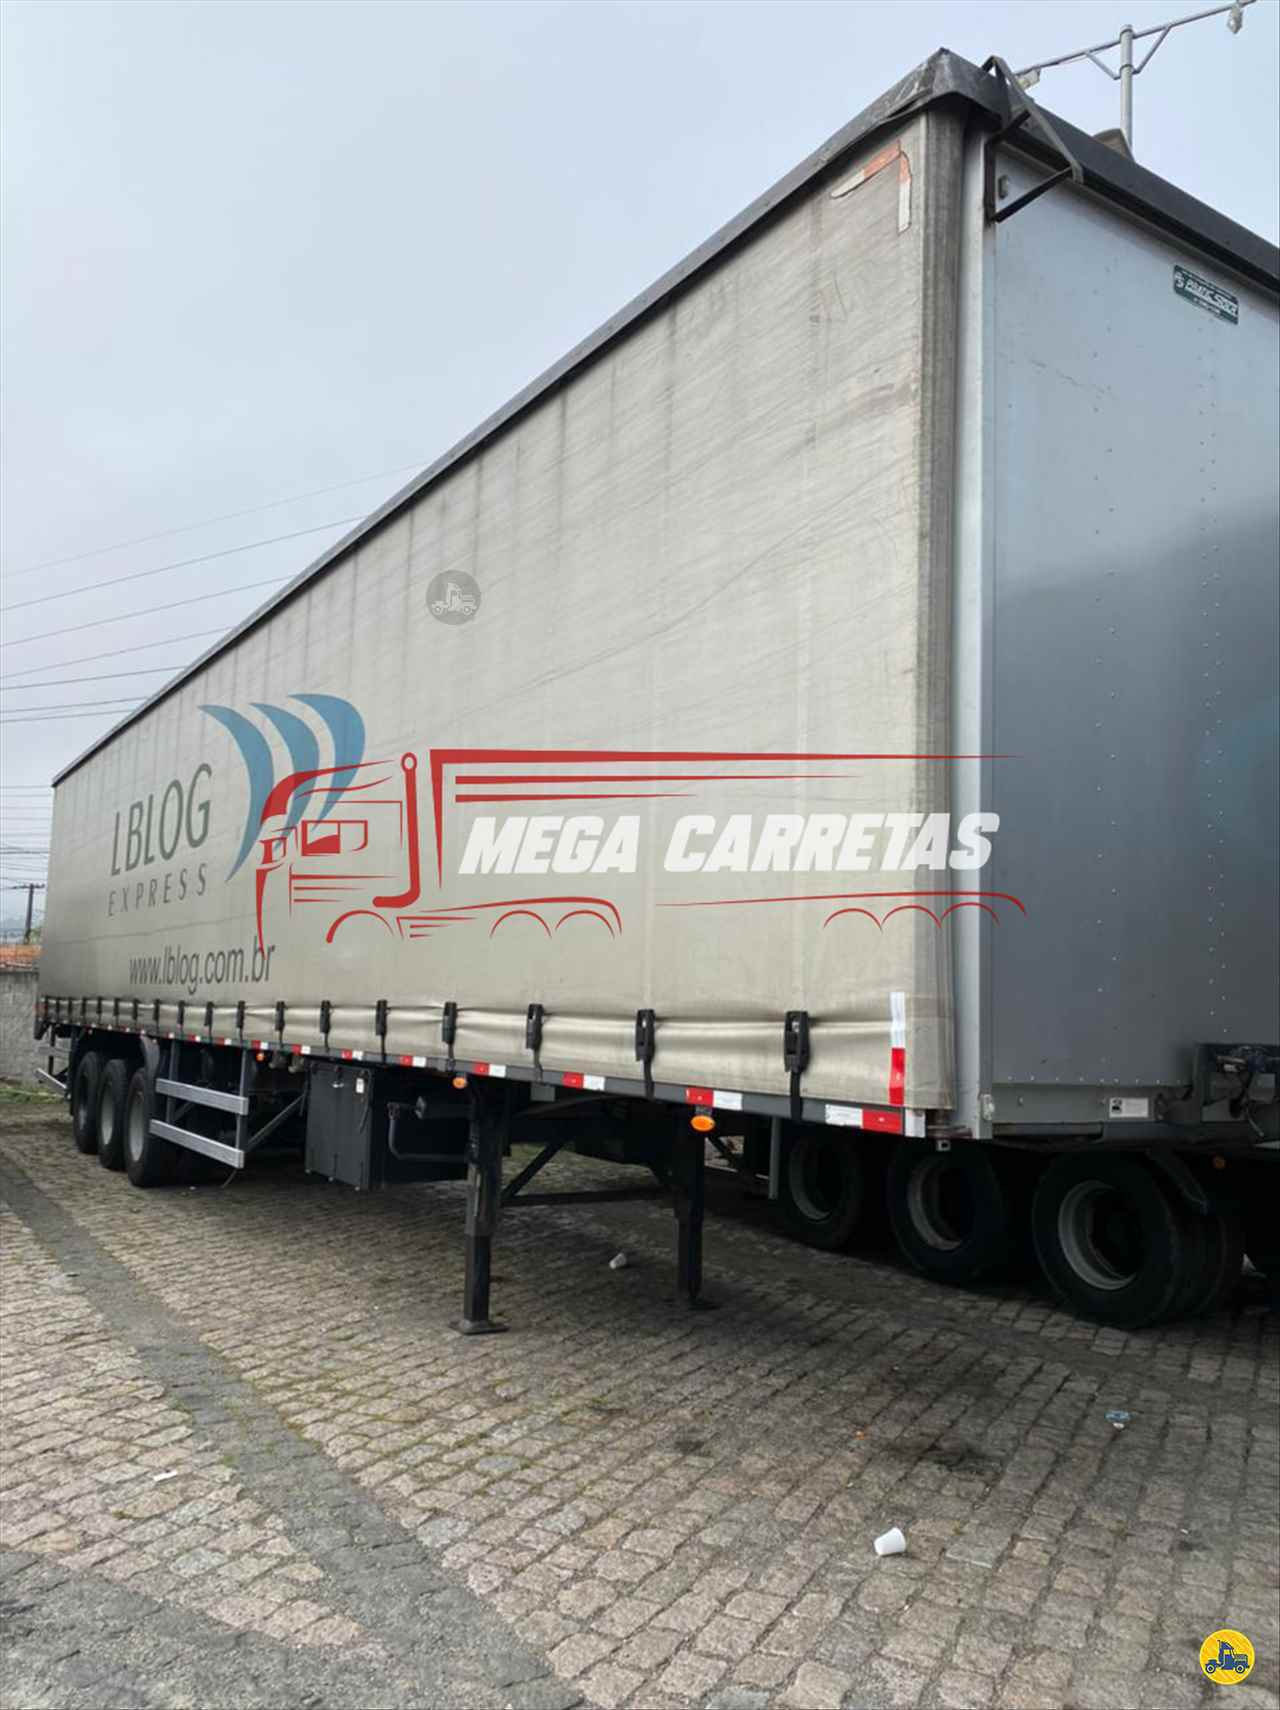 CARRETA SEMI-REBOQUE BAU SIDER Reta Mega Carretas COLOMBO PARANÁ PR